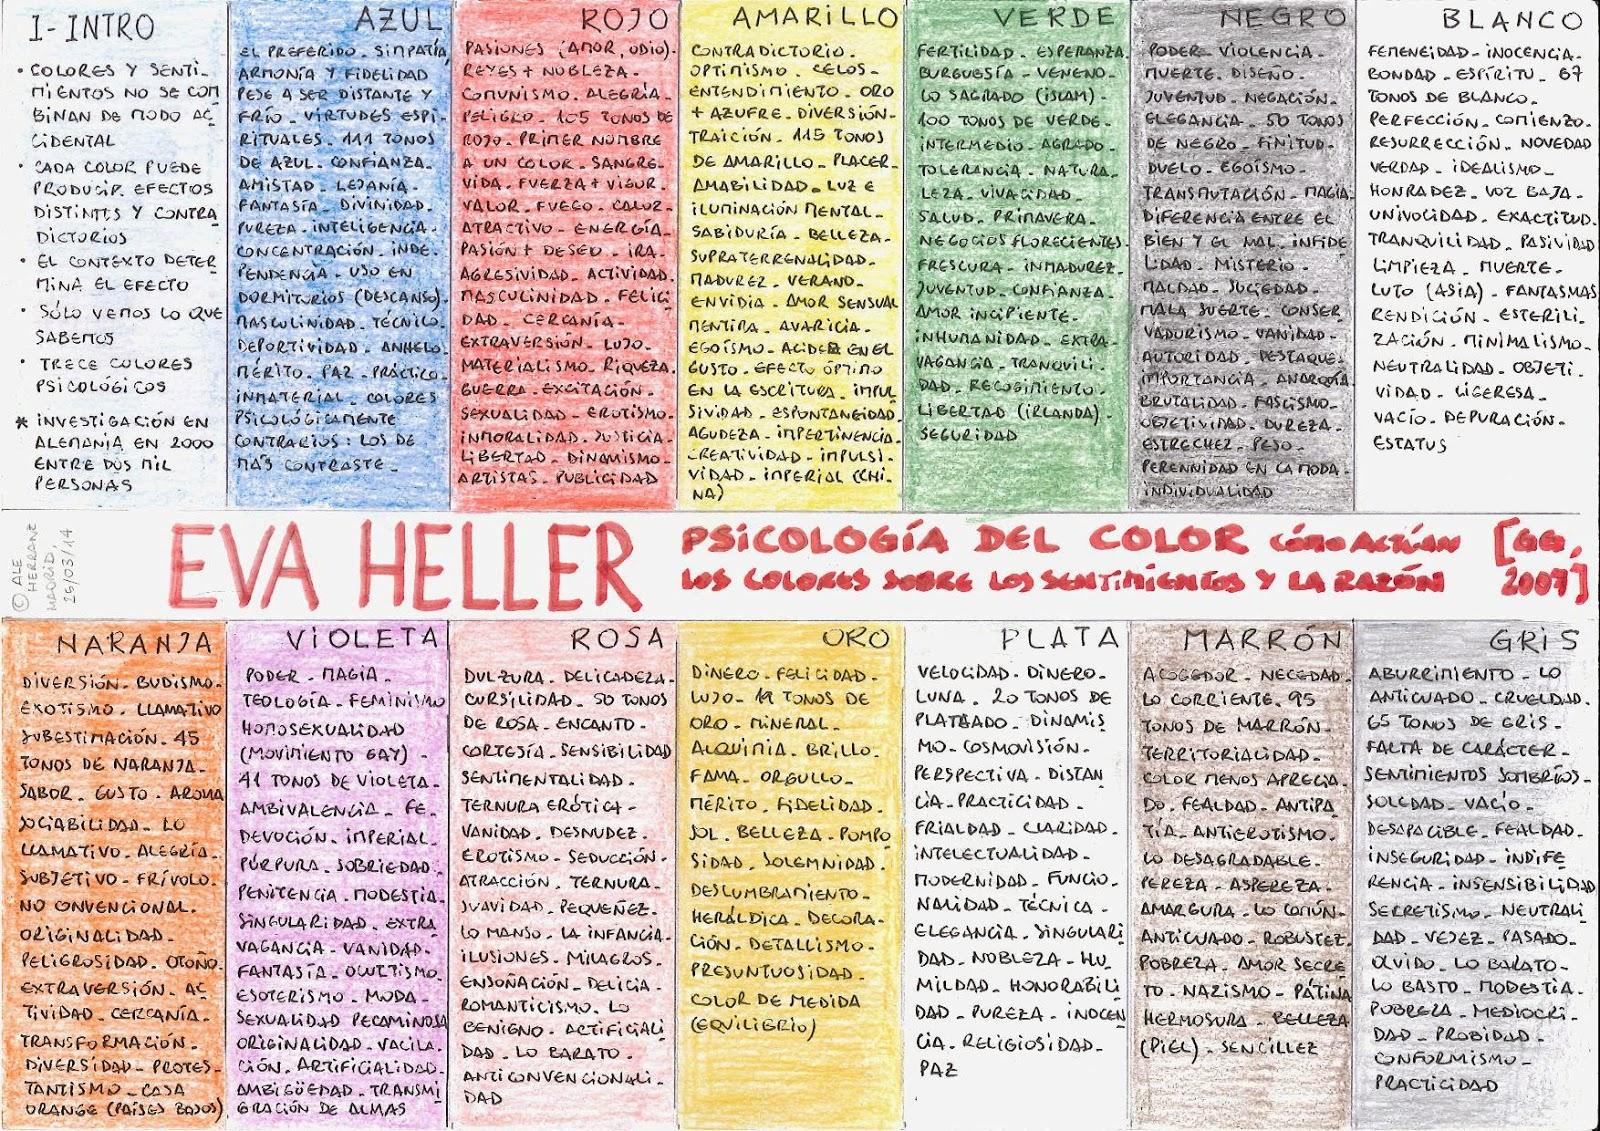 PSICOLOGIA DEL COLOR EVA HELLER EPUB